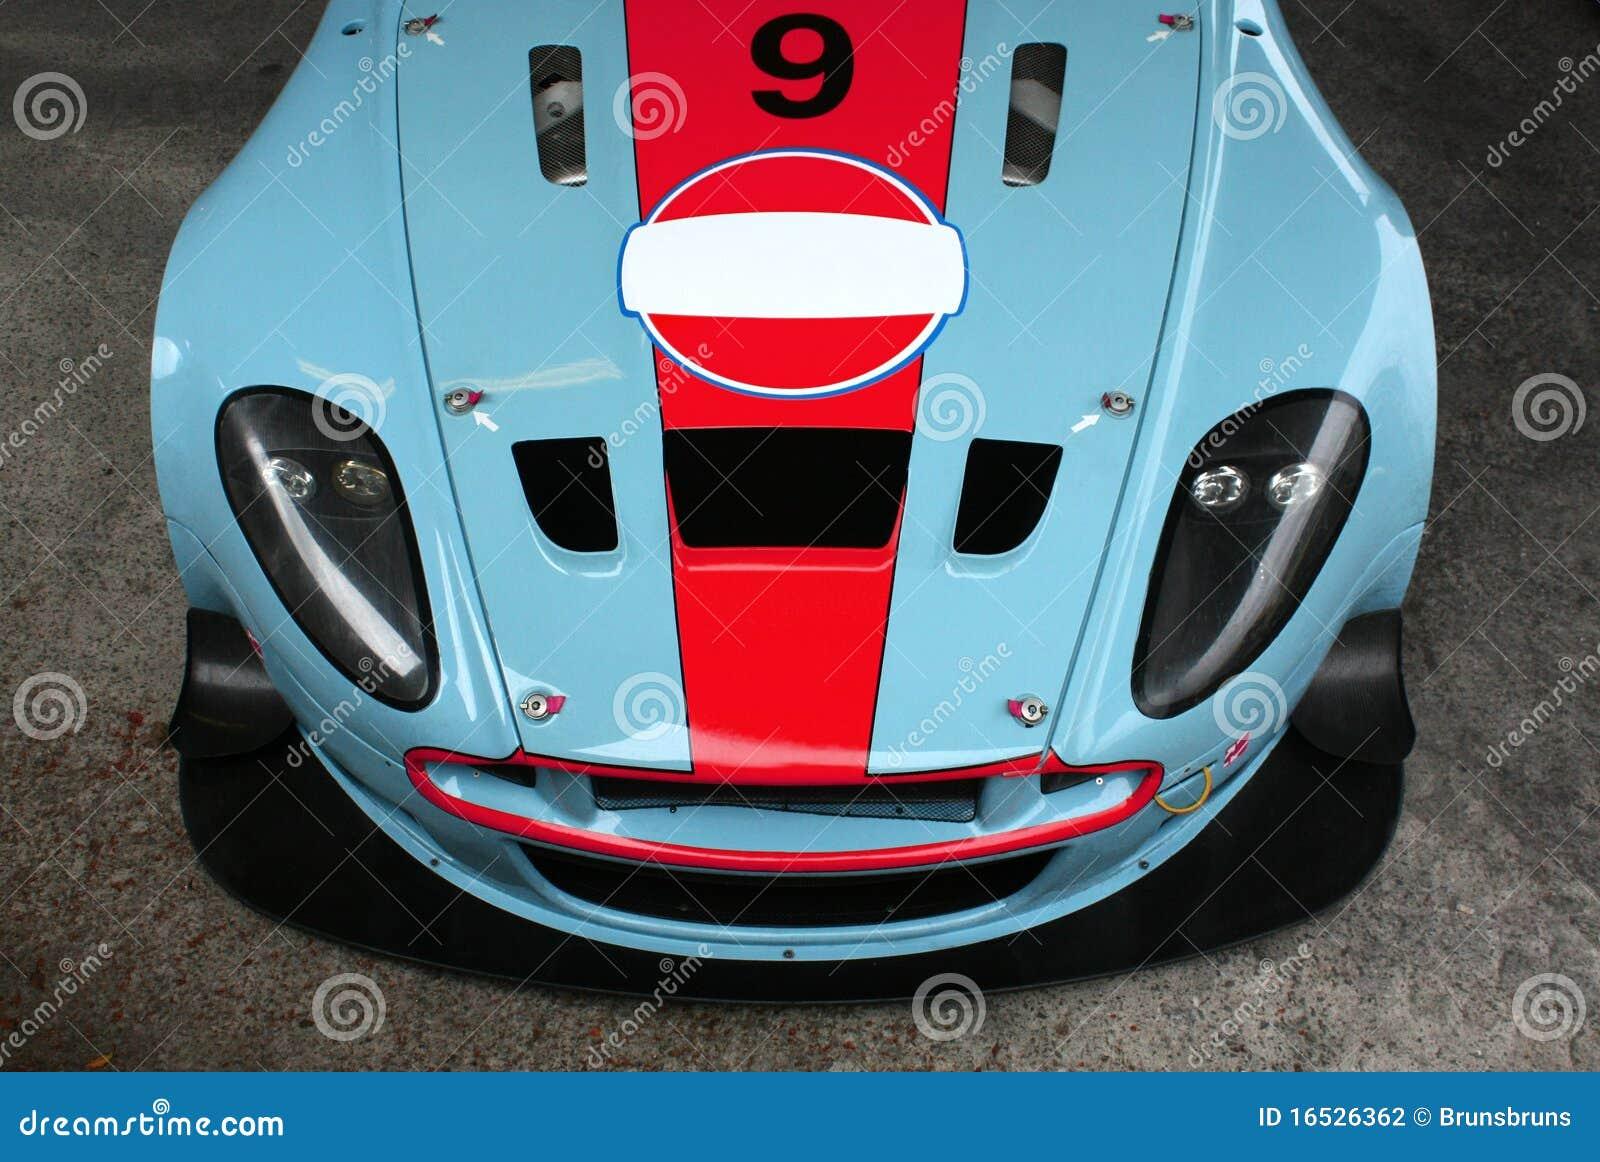 Aston Martin Racing Car Stock Photo Image Of Auto Fast 16526362